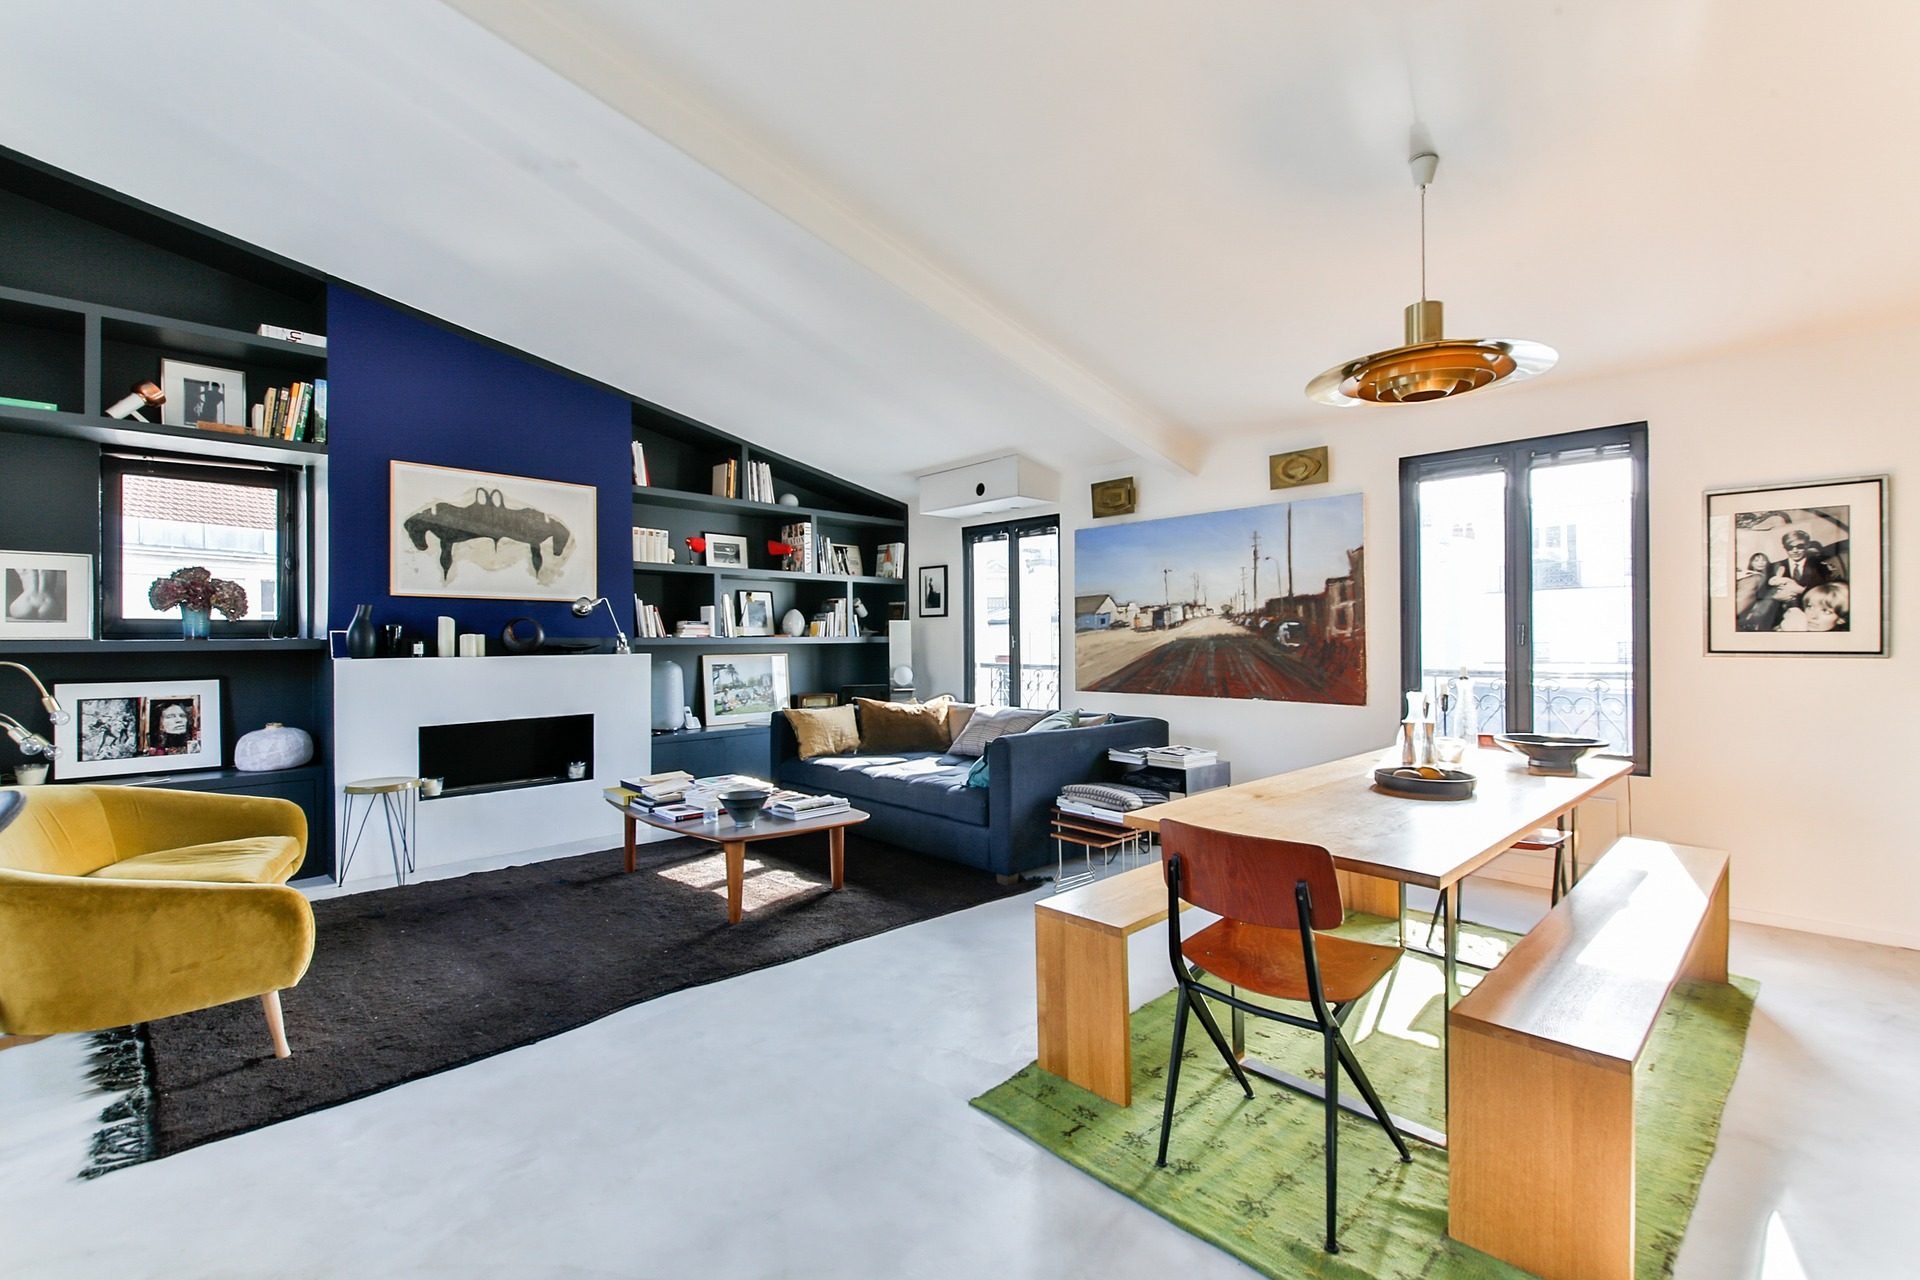 Home Renovation Professionals